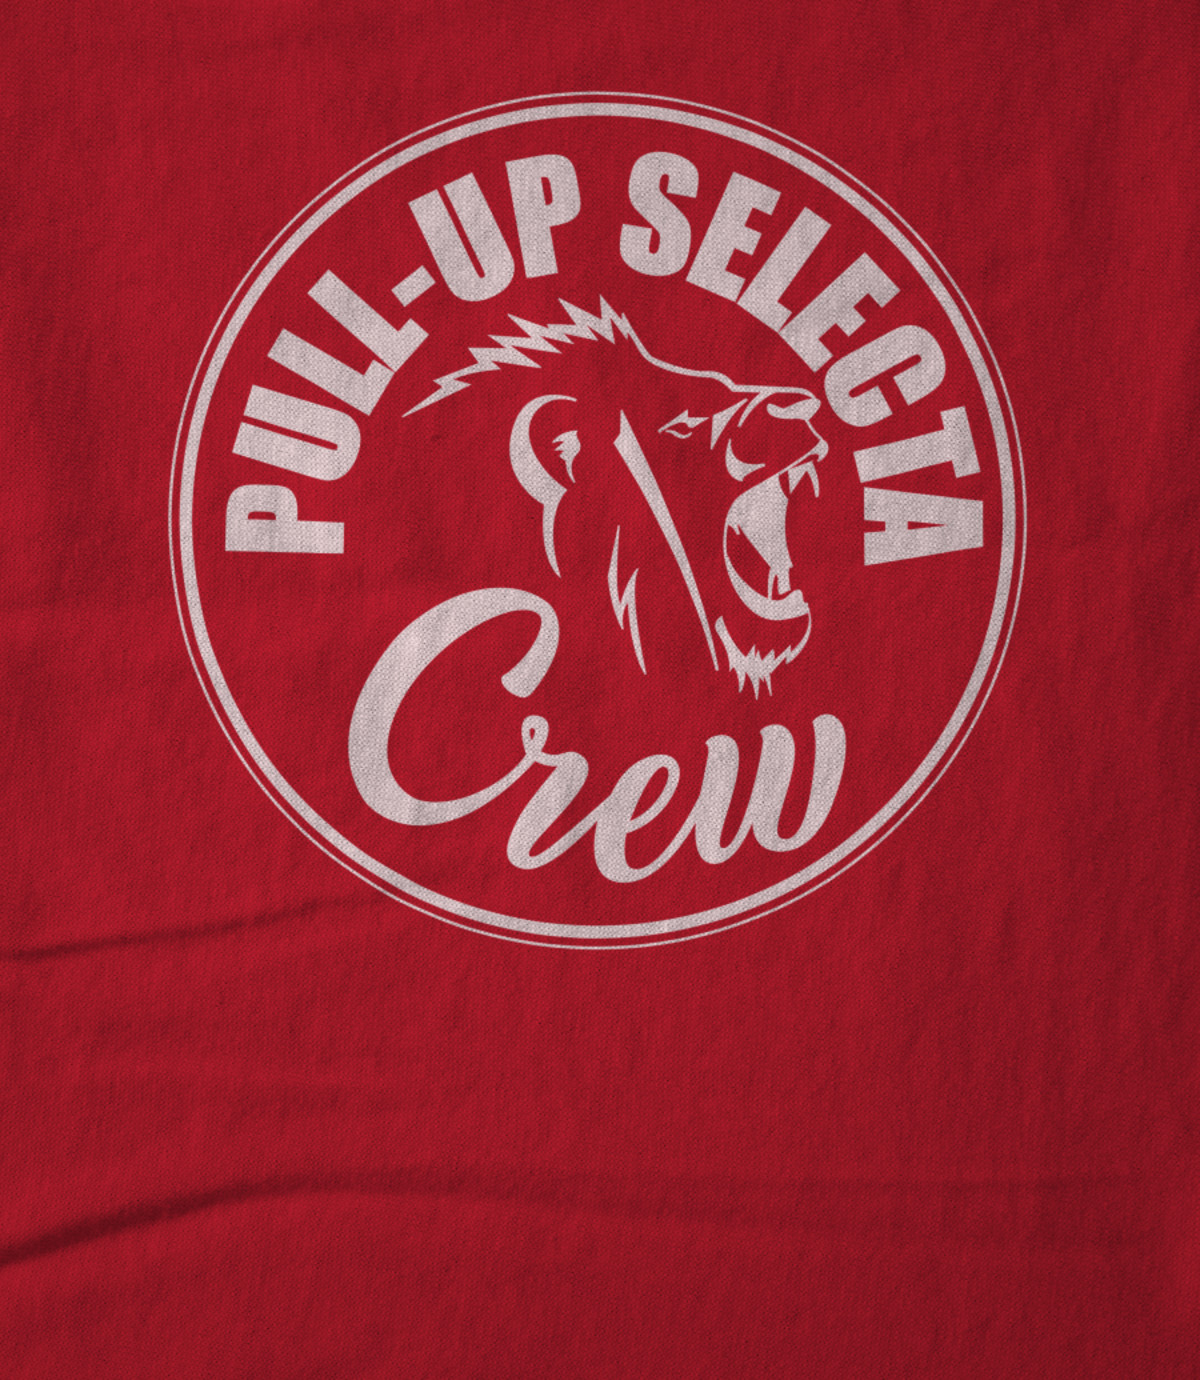 Pull up selecta pull up selecta crew  black  1549132474